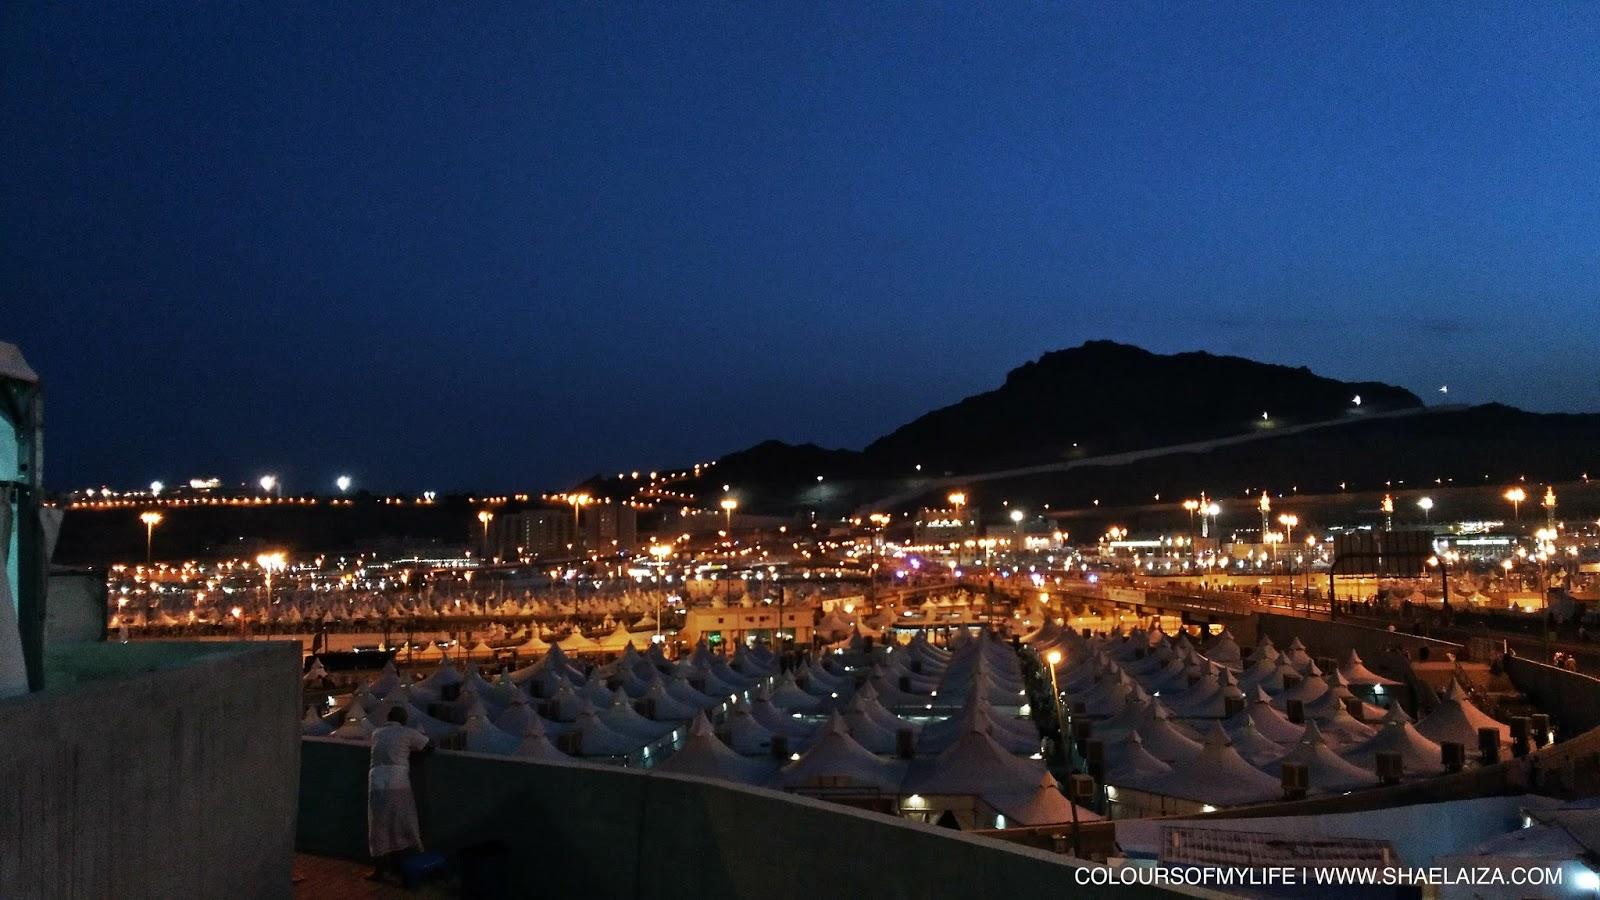 30 Days in Arabia: My Hajj Experience